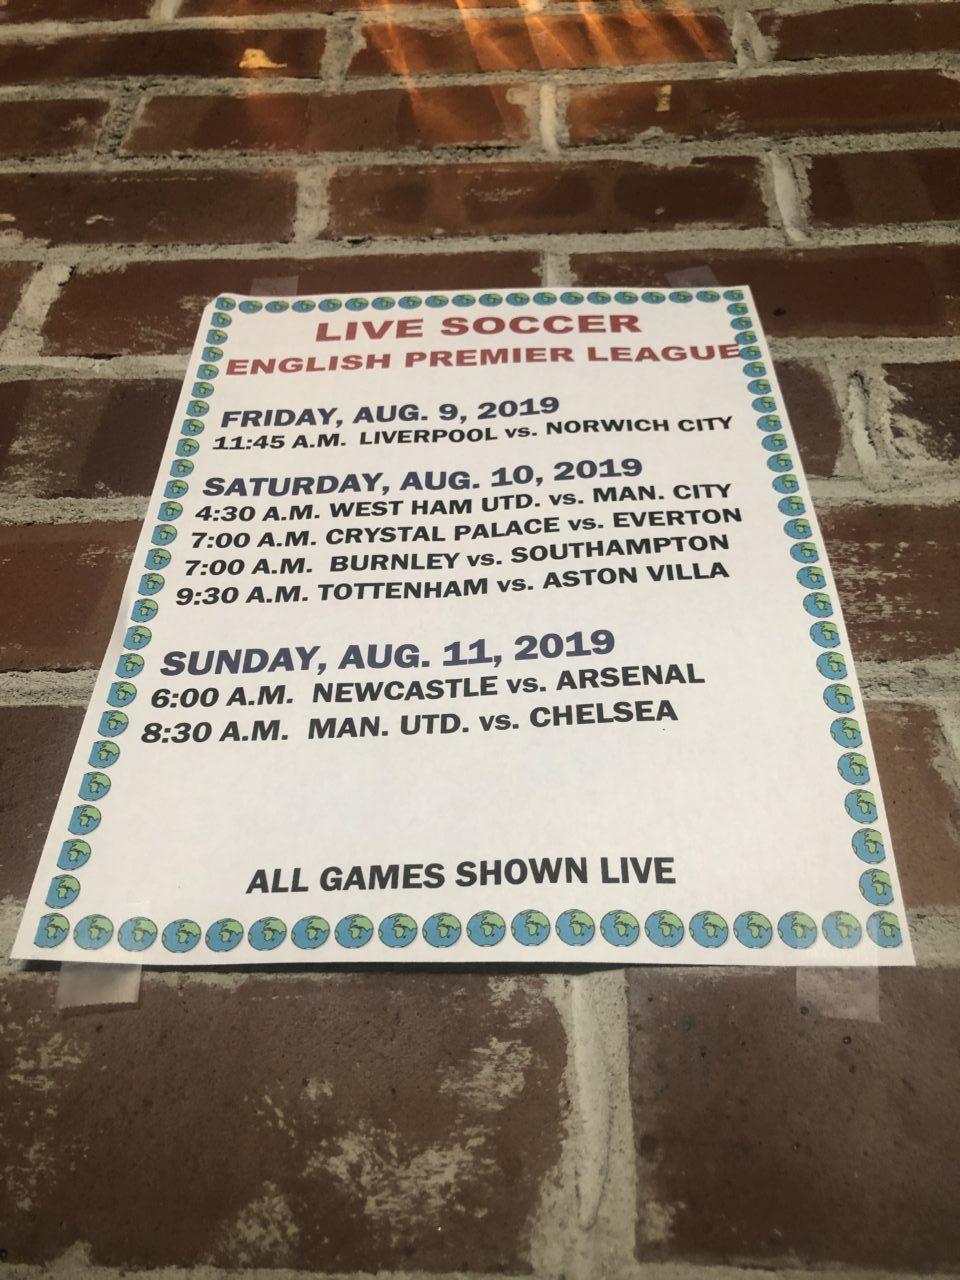 EPL football - August 2019 schedule